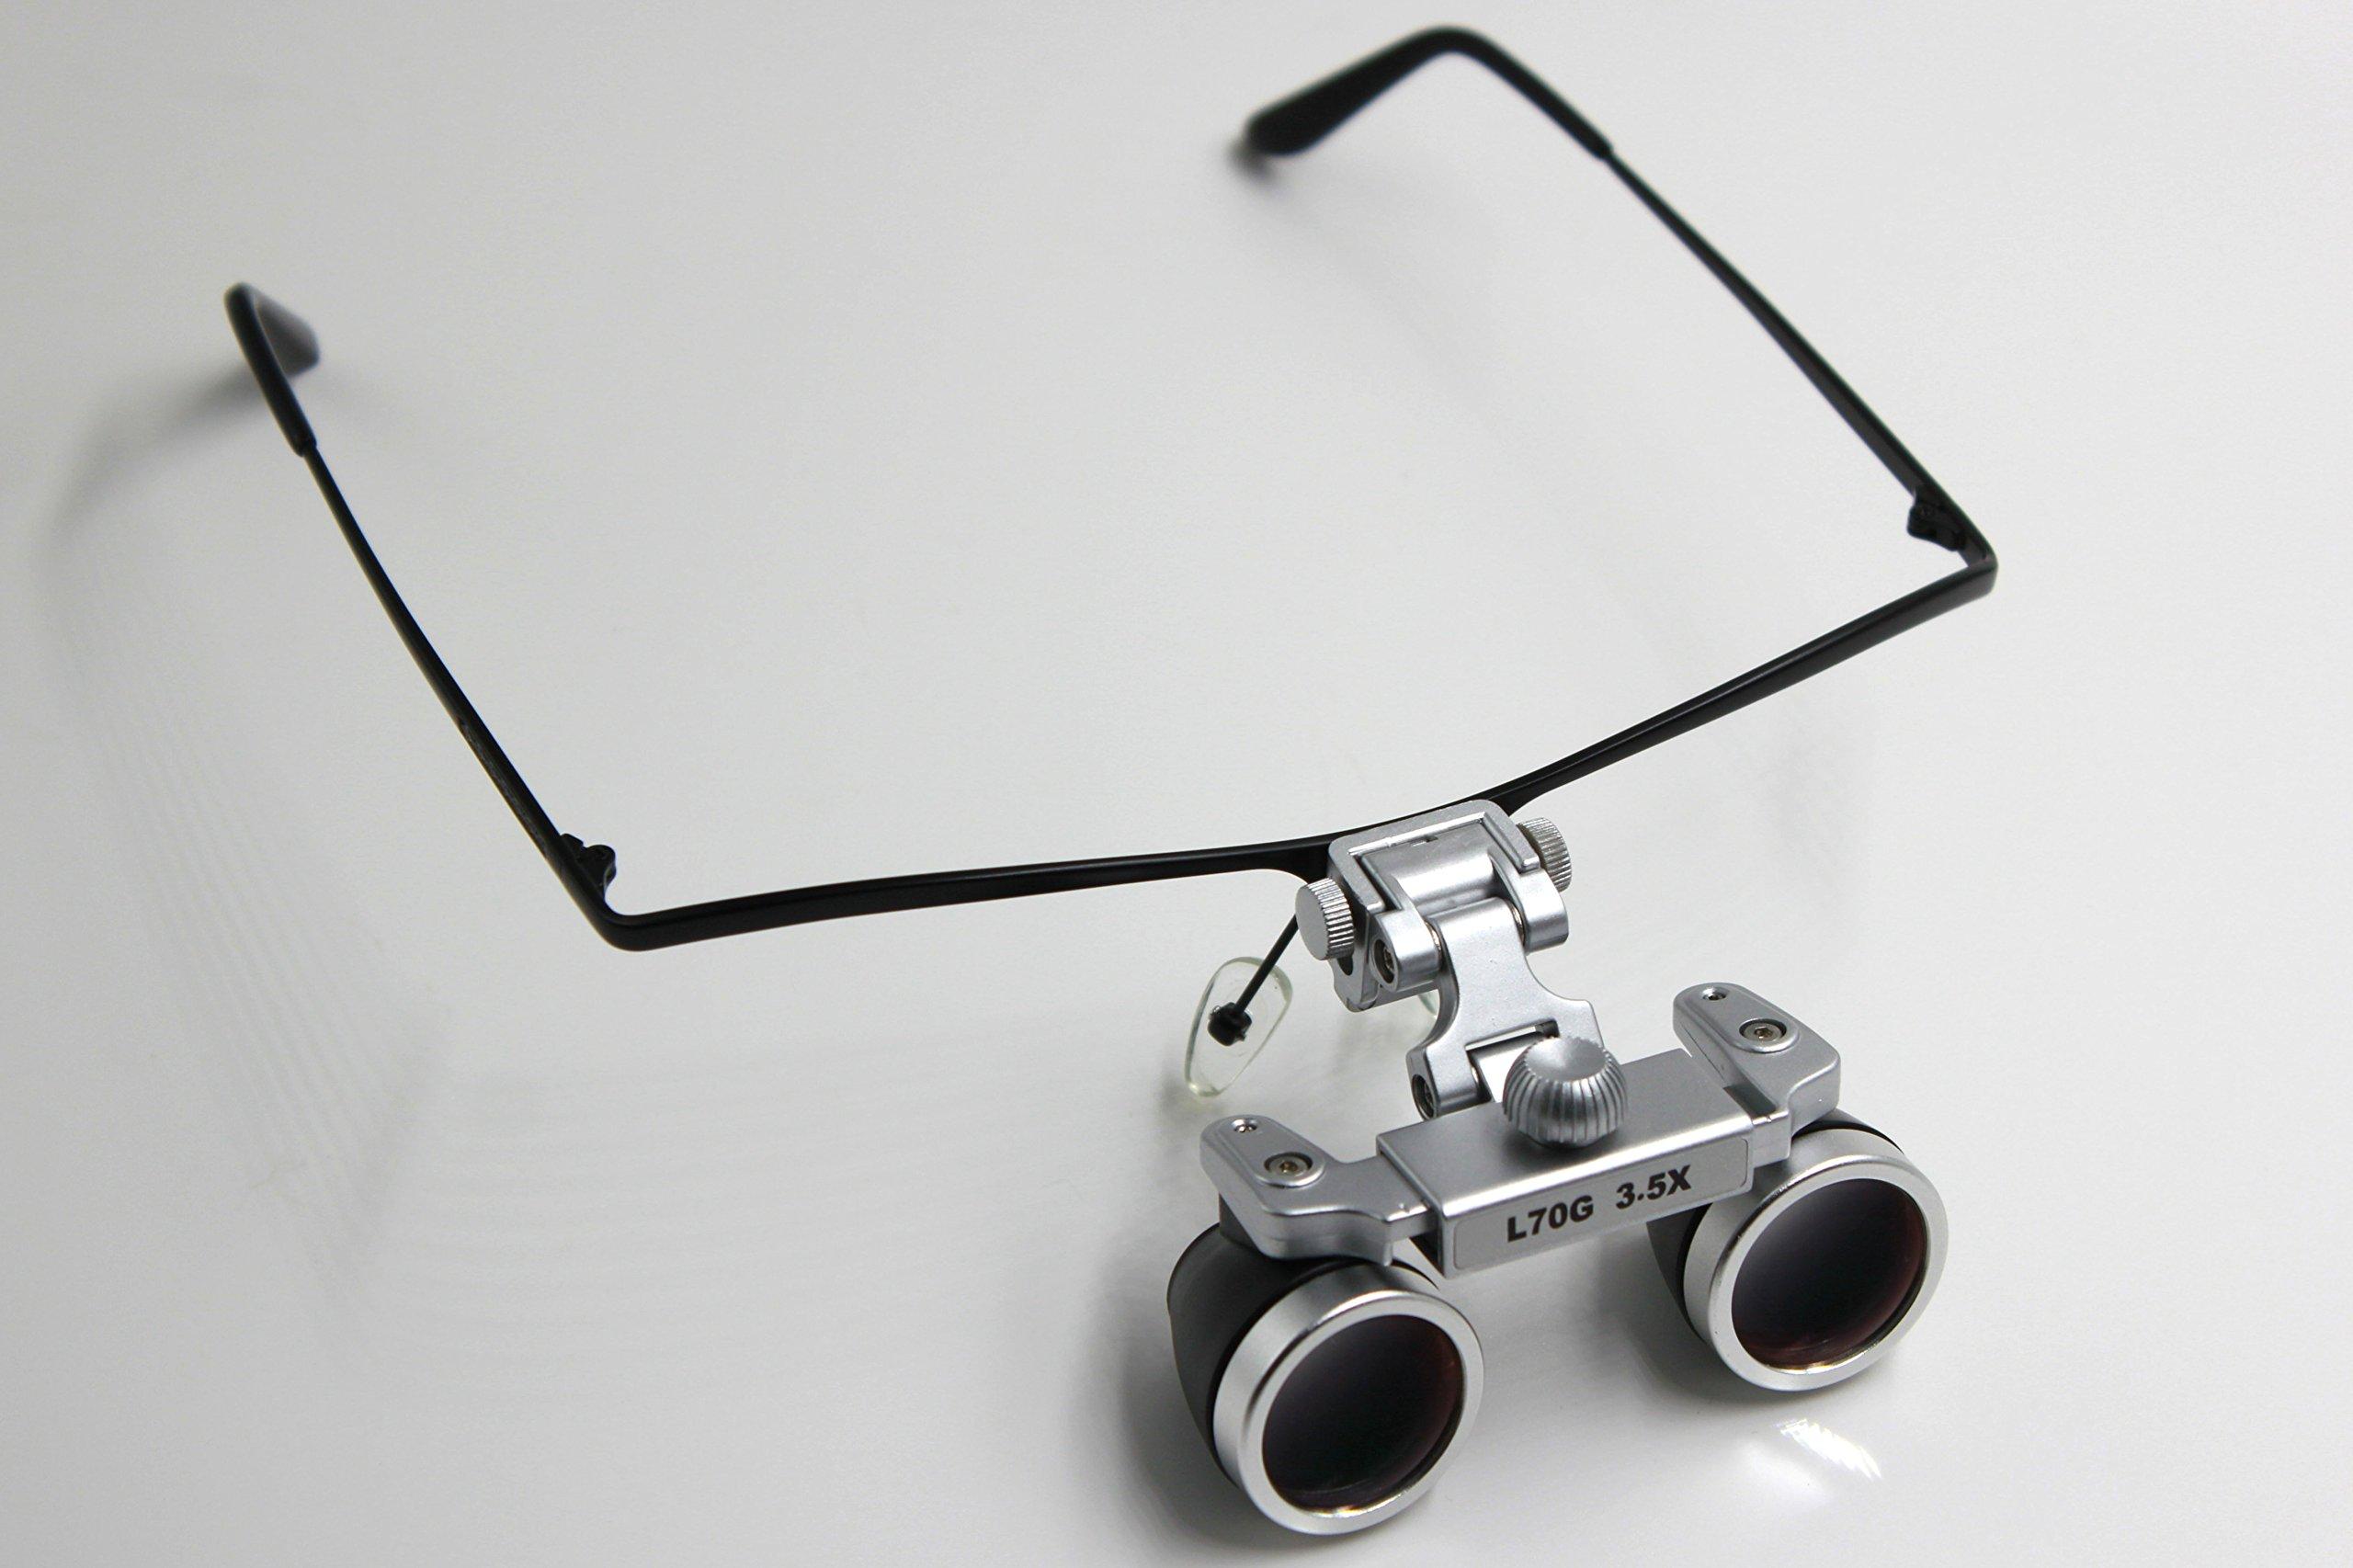 NORTHOPE Best Optics High-Definition Waterproof L70G 3.5X 420mm Surgical Medical Dental Binocular Loupes with Half Frame